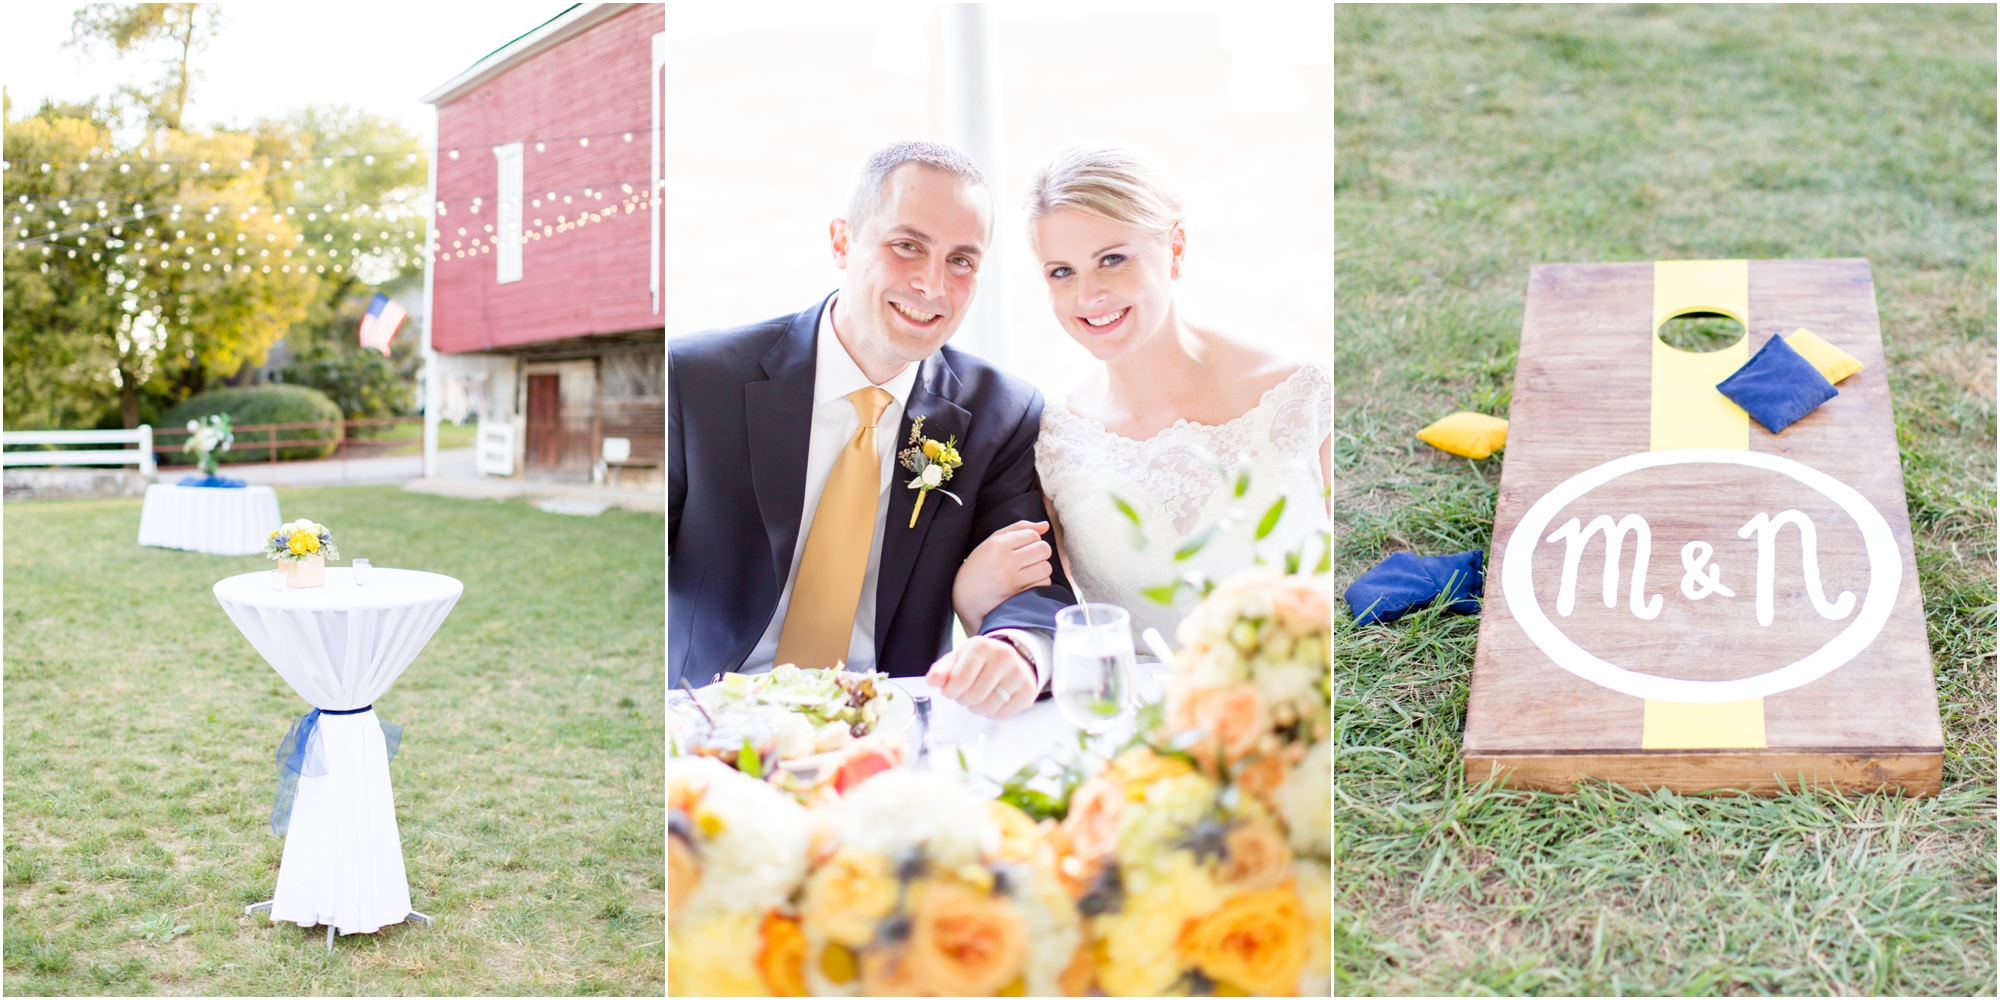 7-Miano Wedding Reception-805_anna grace photography maryland wedding photographer rockland estates.jpg